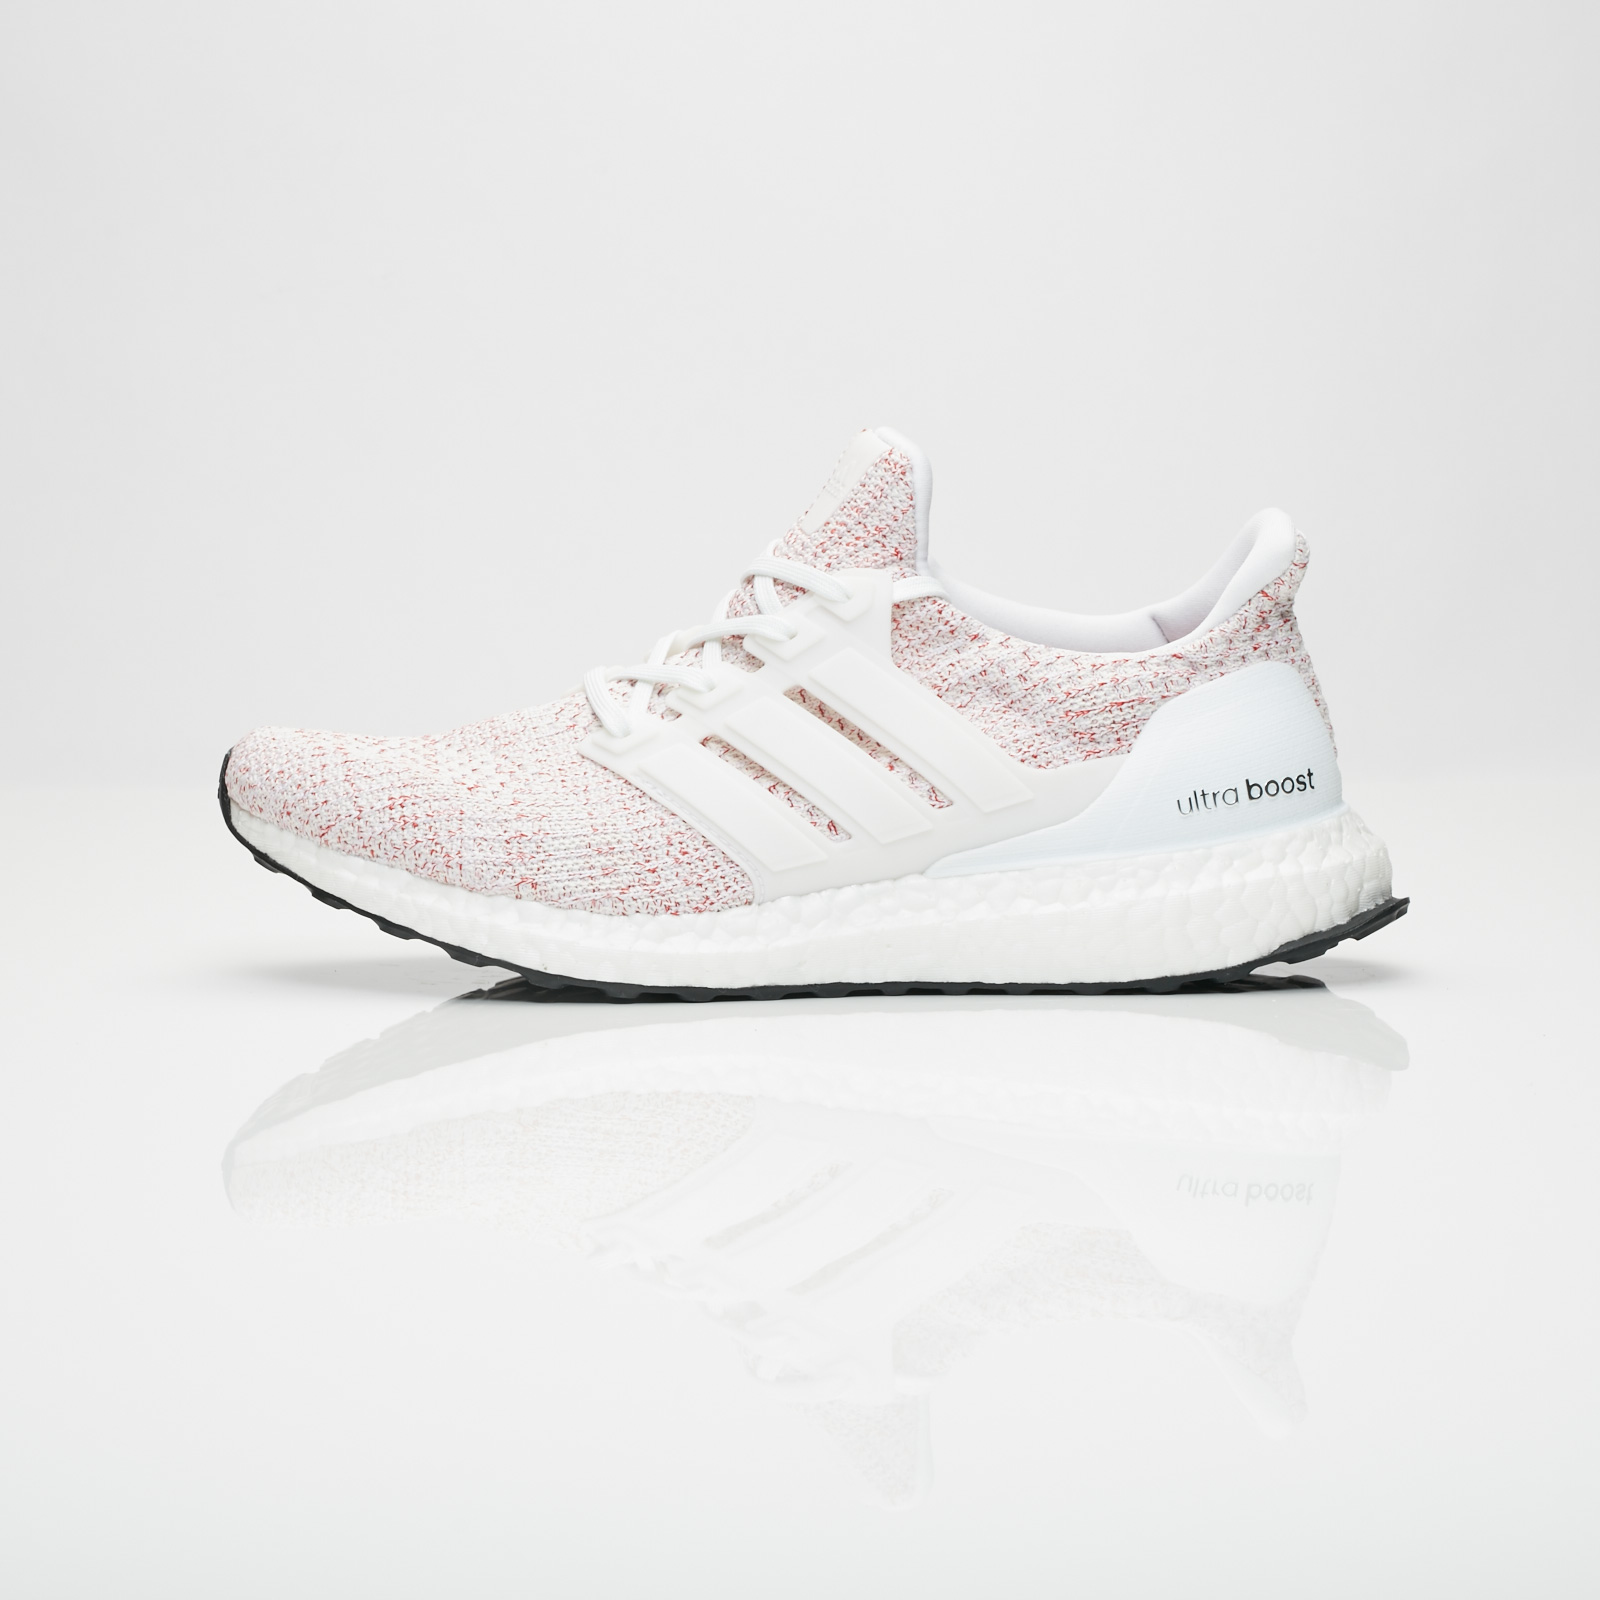 00ae60b09 adidas Ultra Boost - Bb6169 - Sneakersnstuff